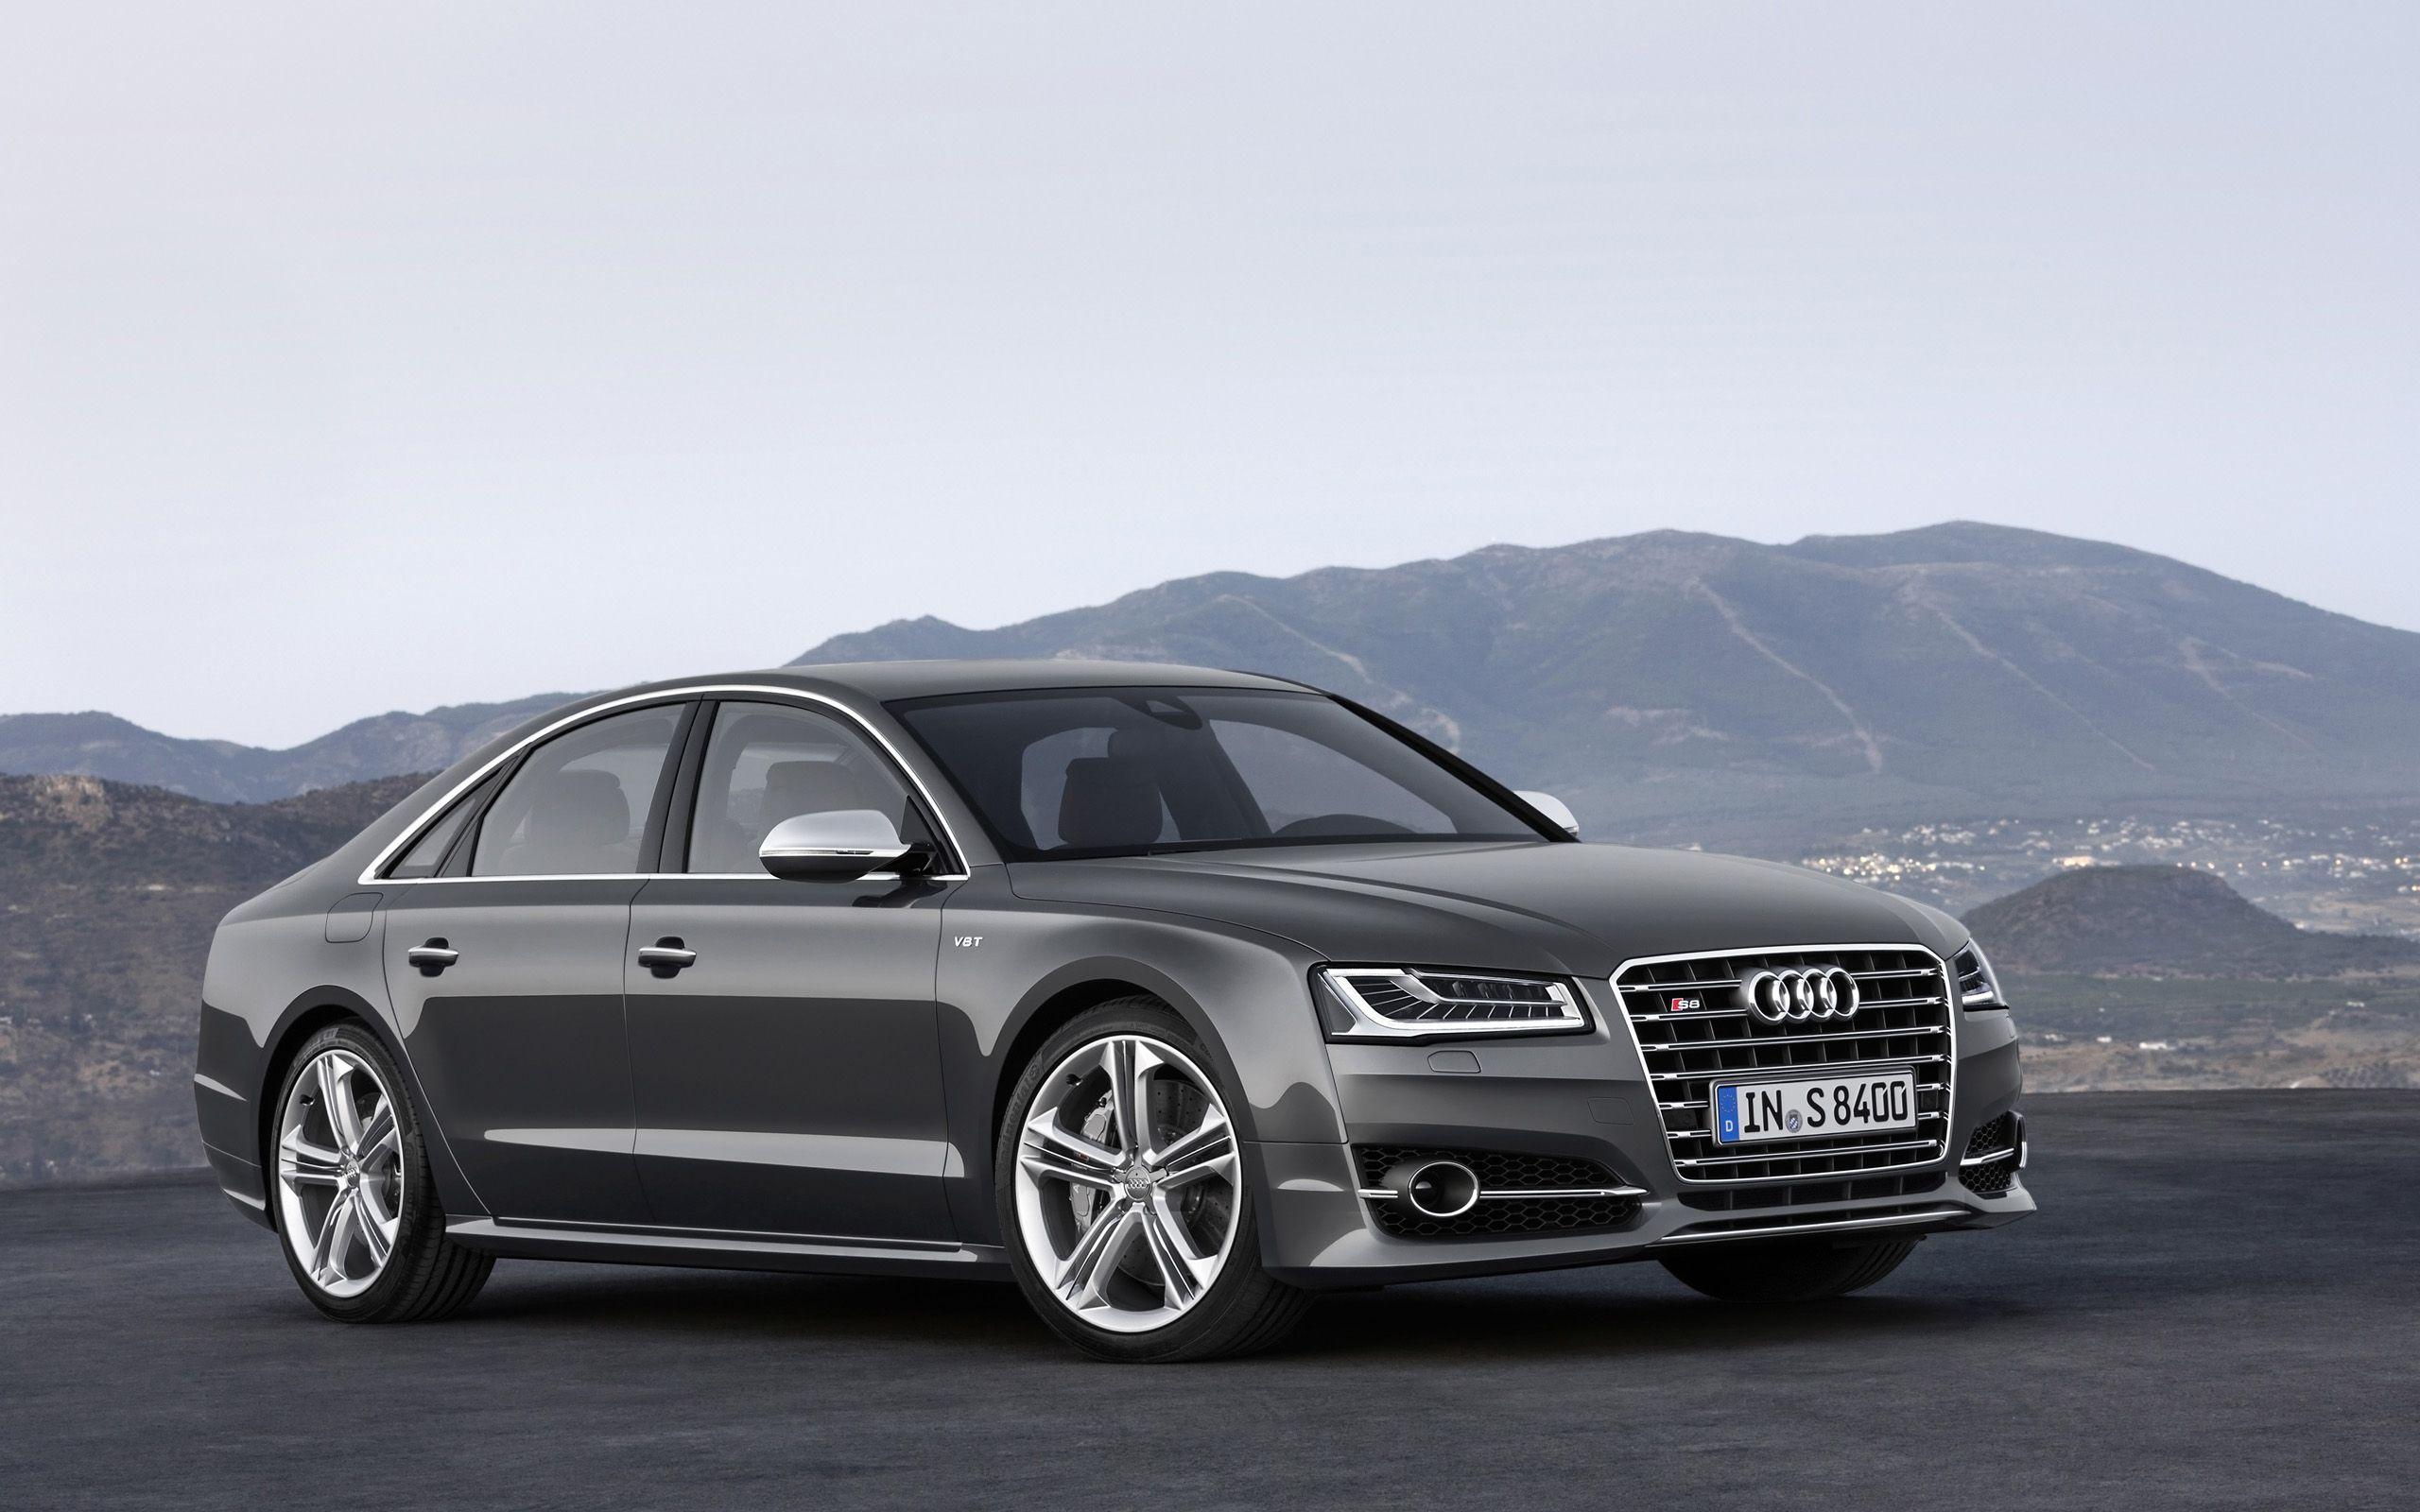 2014 Audi S8 Cars Pinterest Audi And Cars